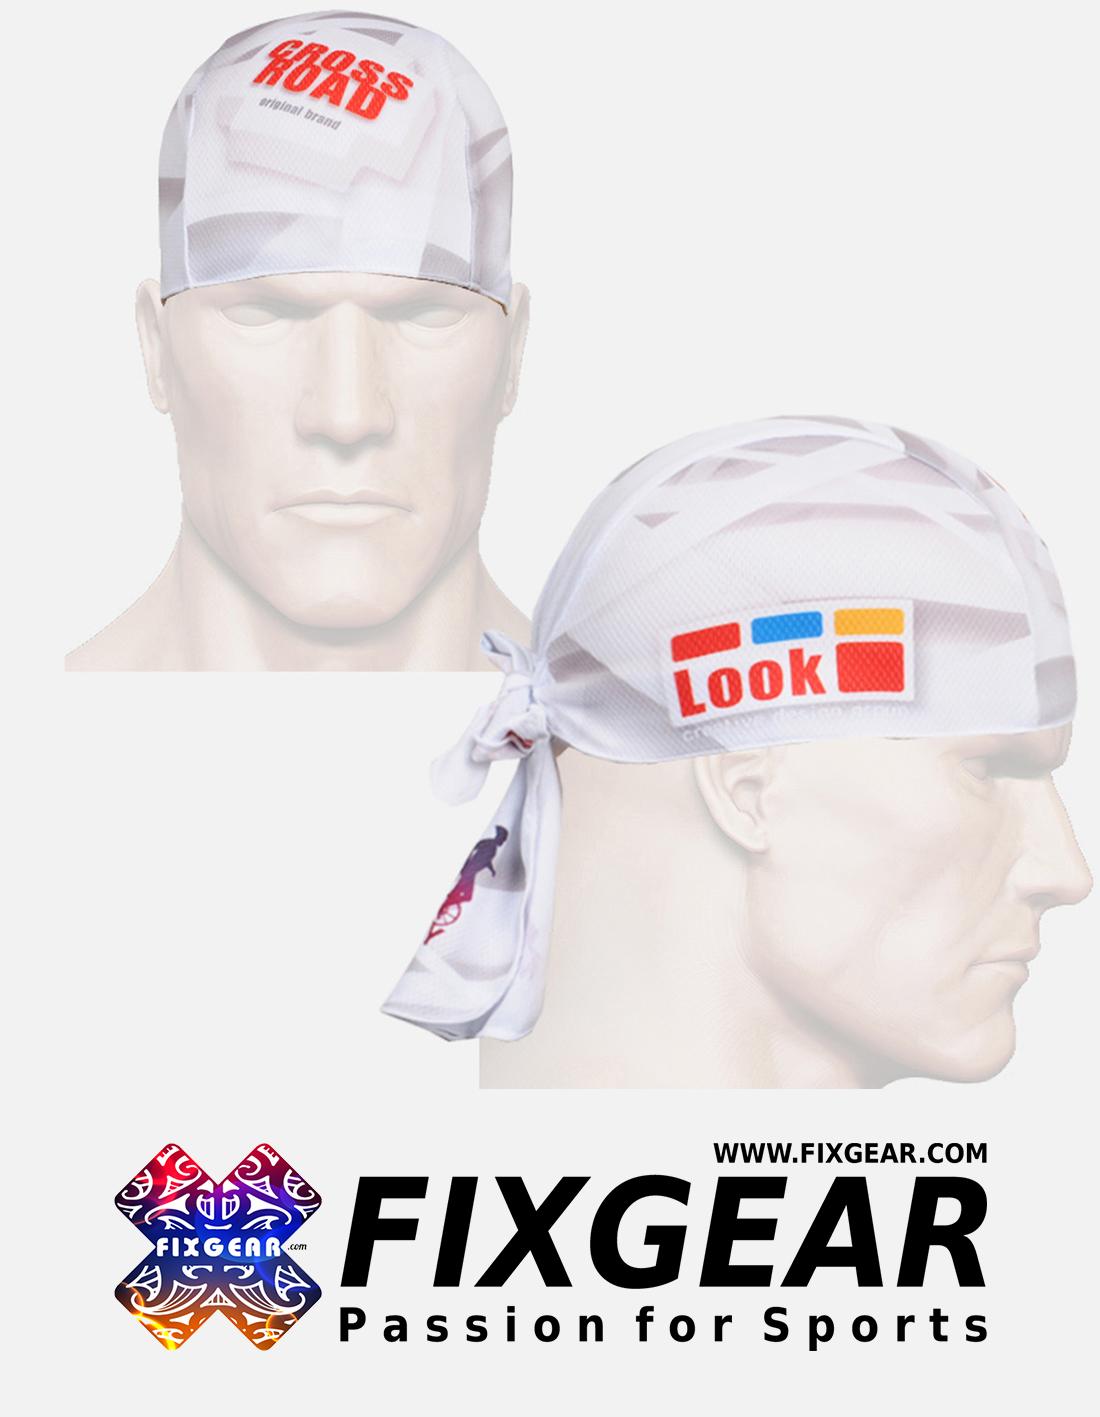 FIXGEAR D-14 Cycling Skull cap, Bandana